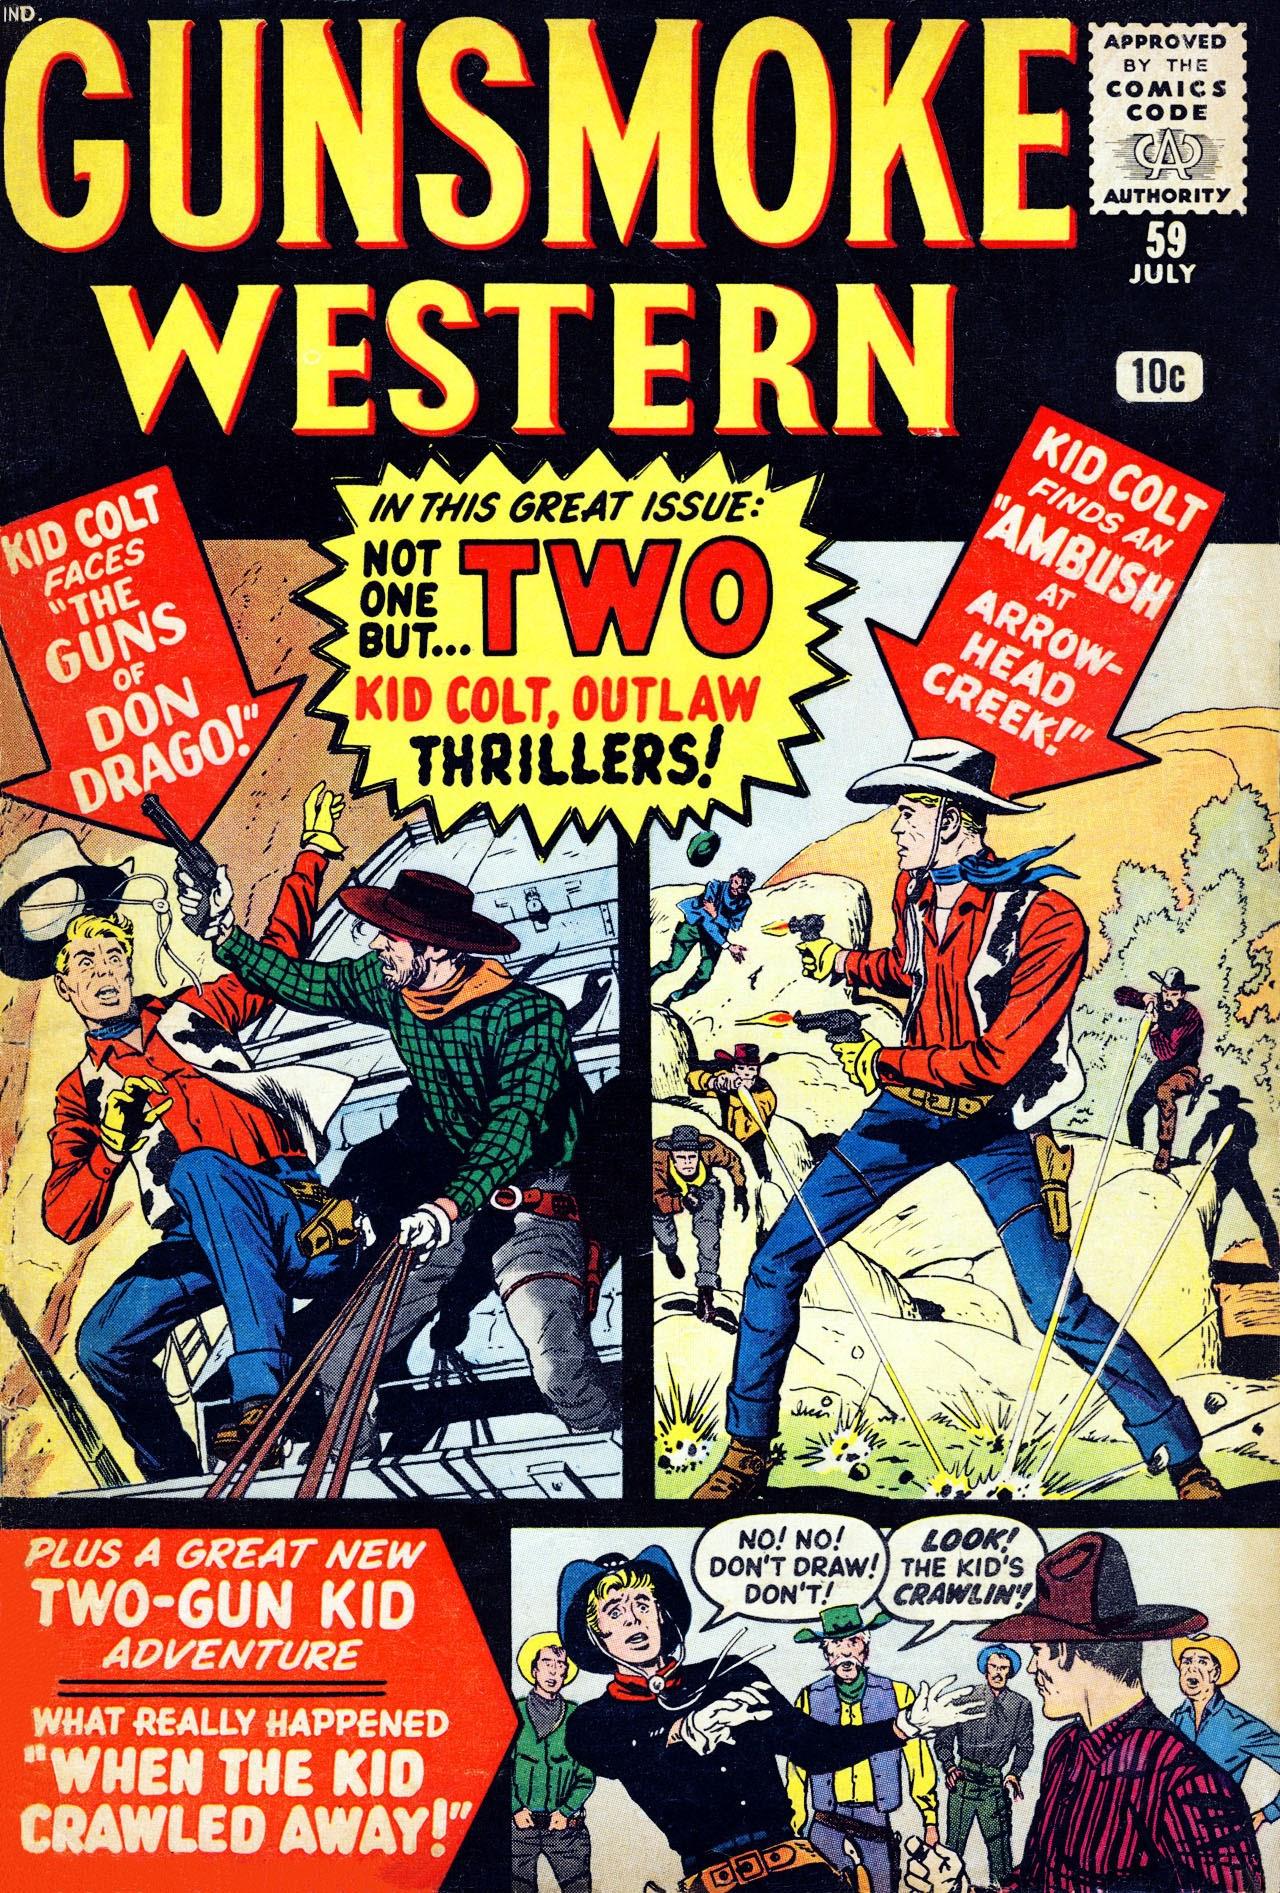 Gunsmoke Western 59 Page 1